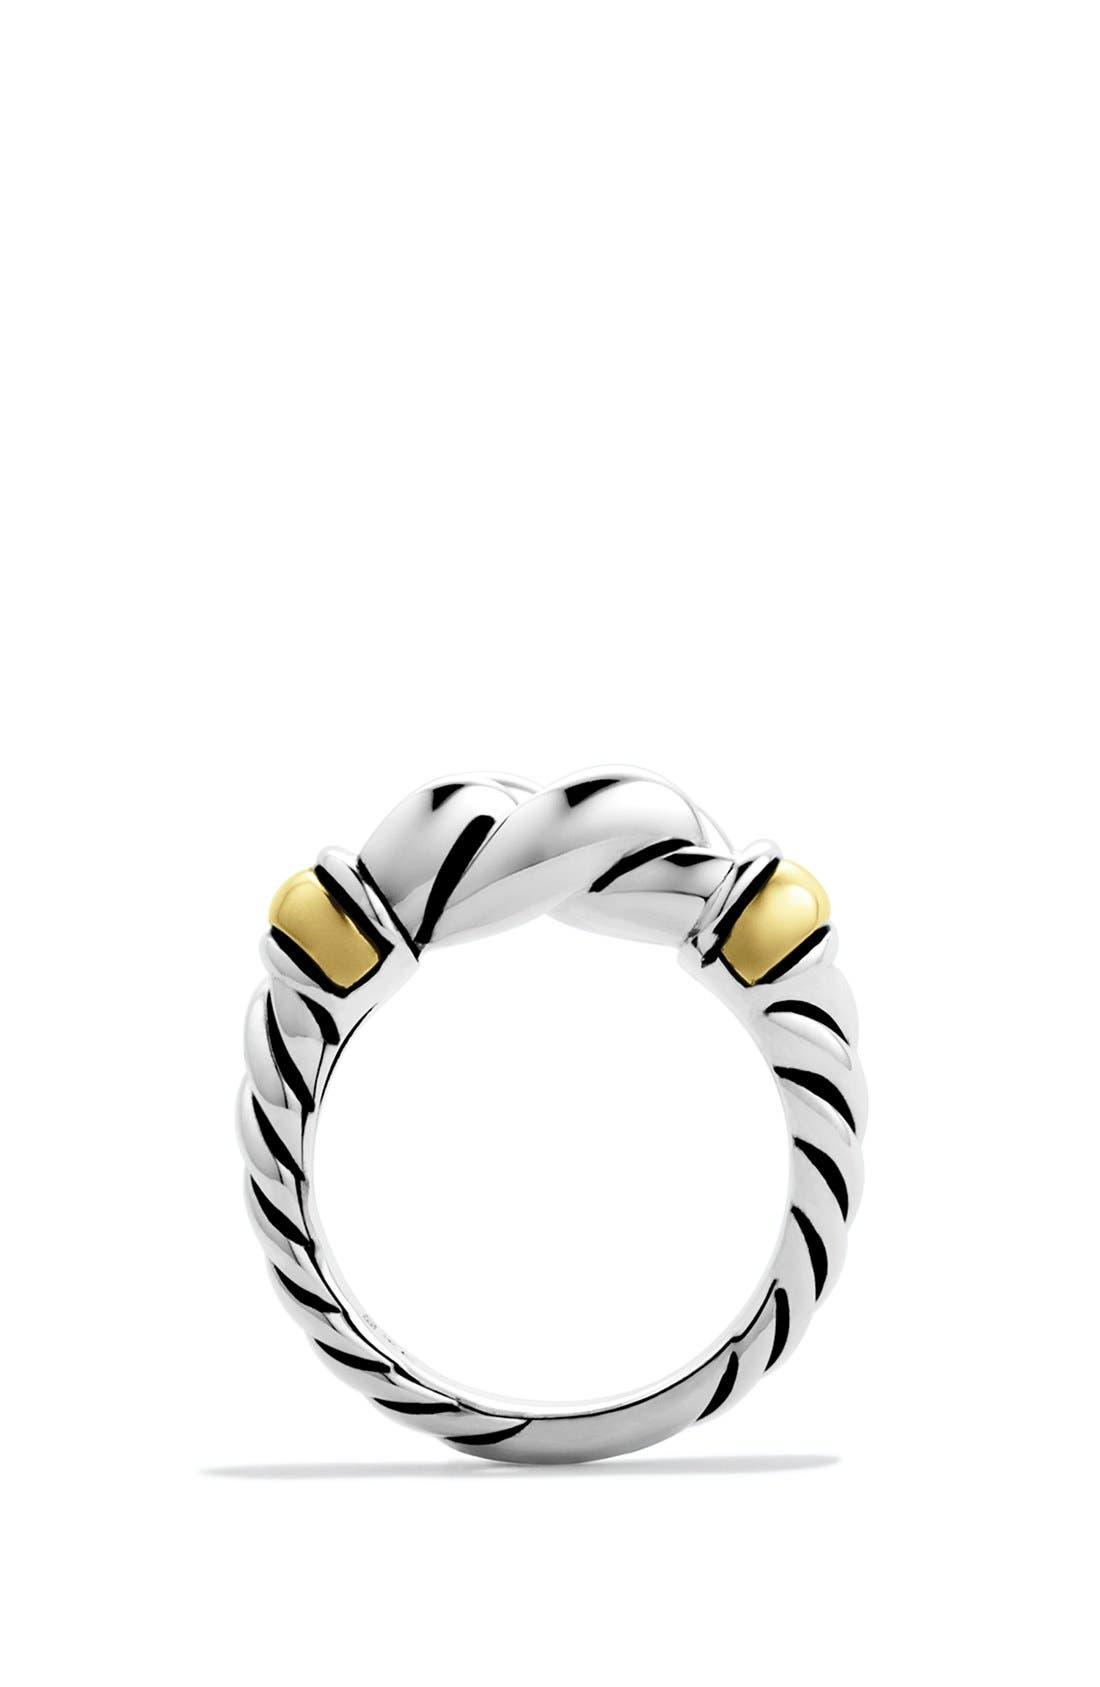 DAVID YURMAN,                             'Metro' Ring with Gold,                             Alternate thumbnail 4, color,                             040